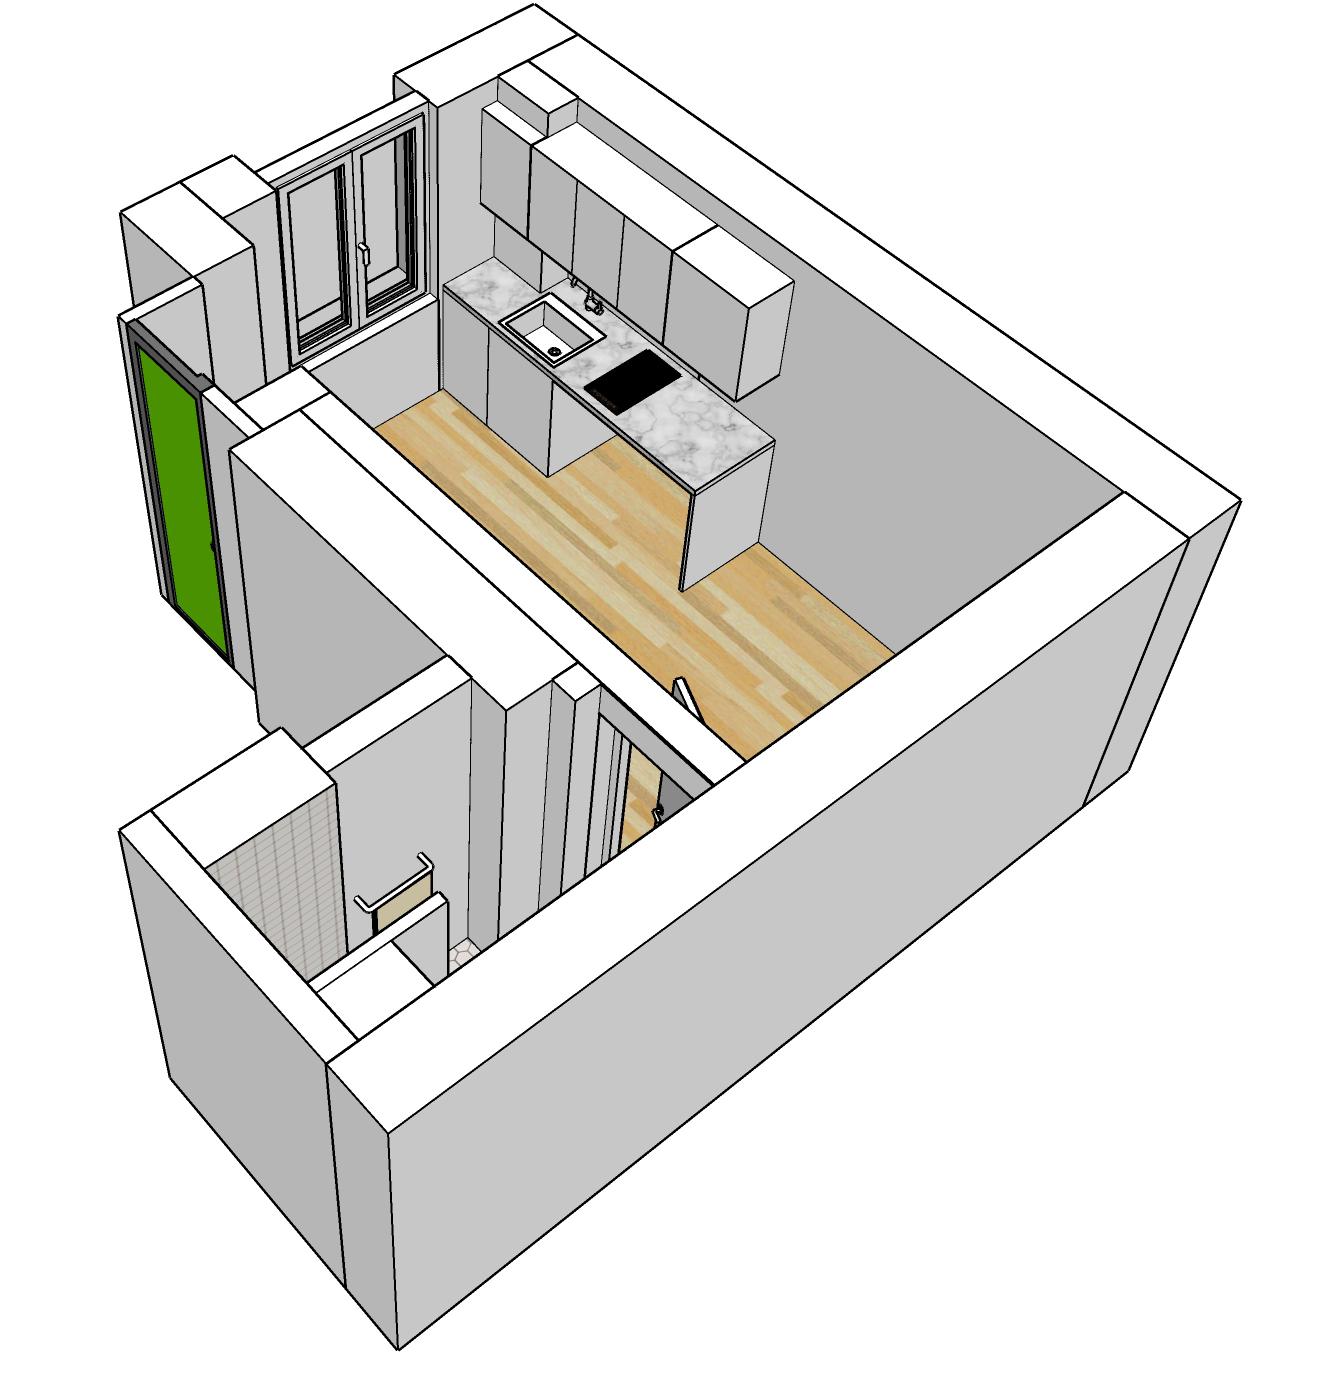 Plan-Axo2.jpg